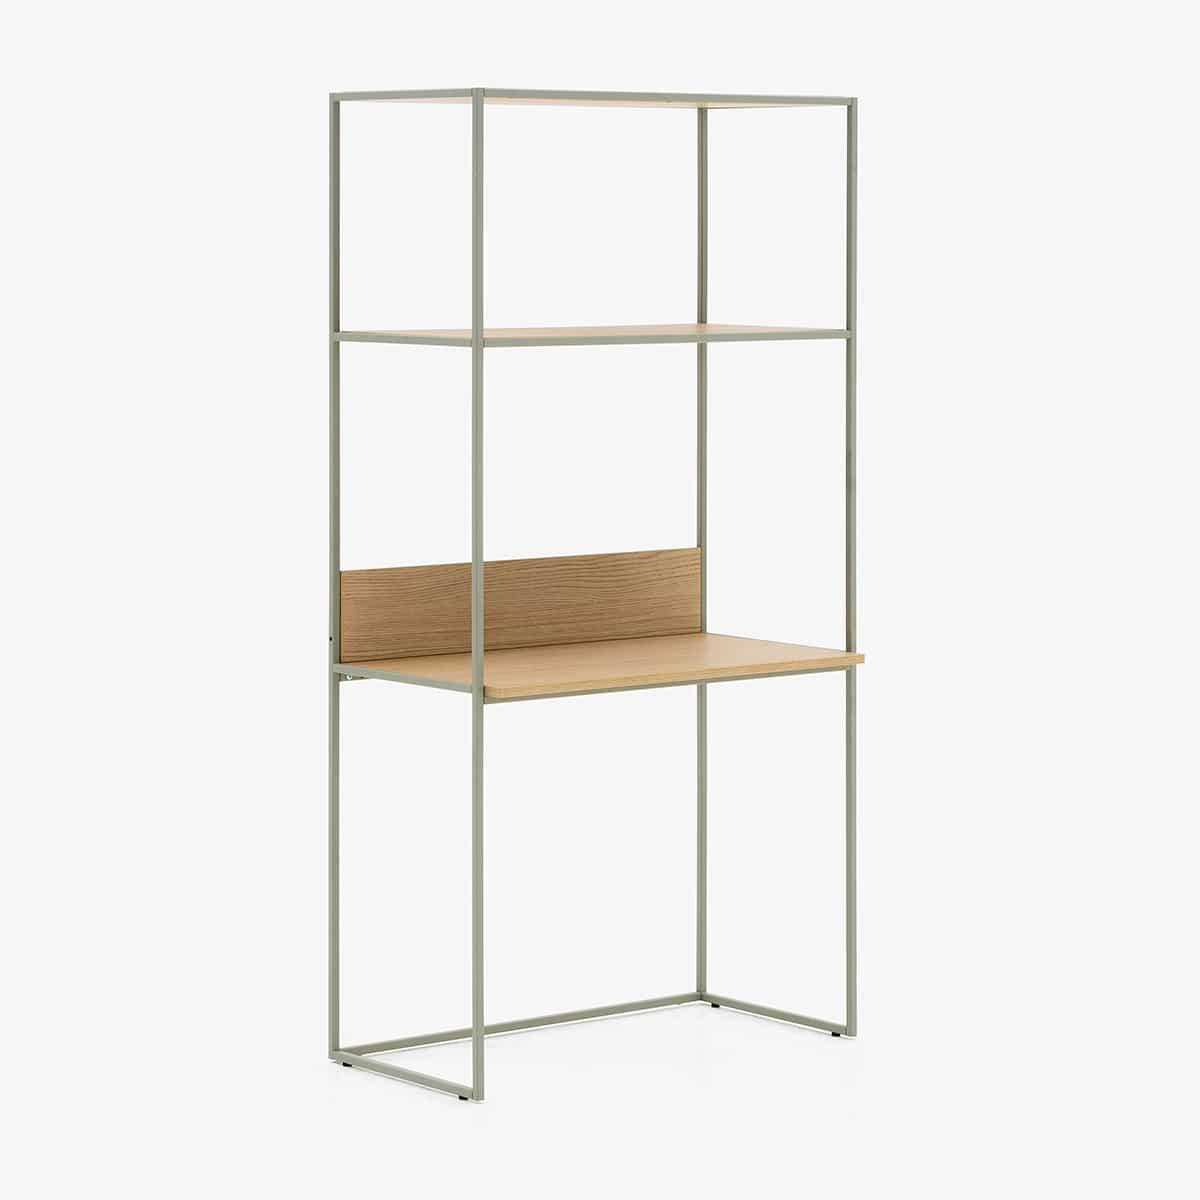 crate-compact-shelving-oak-stone-04